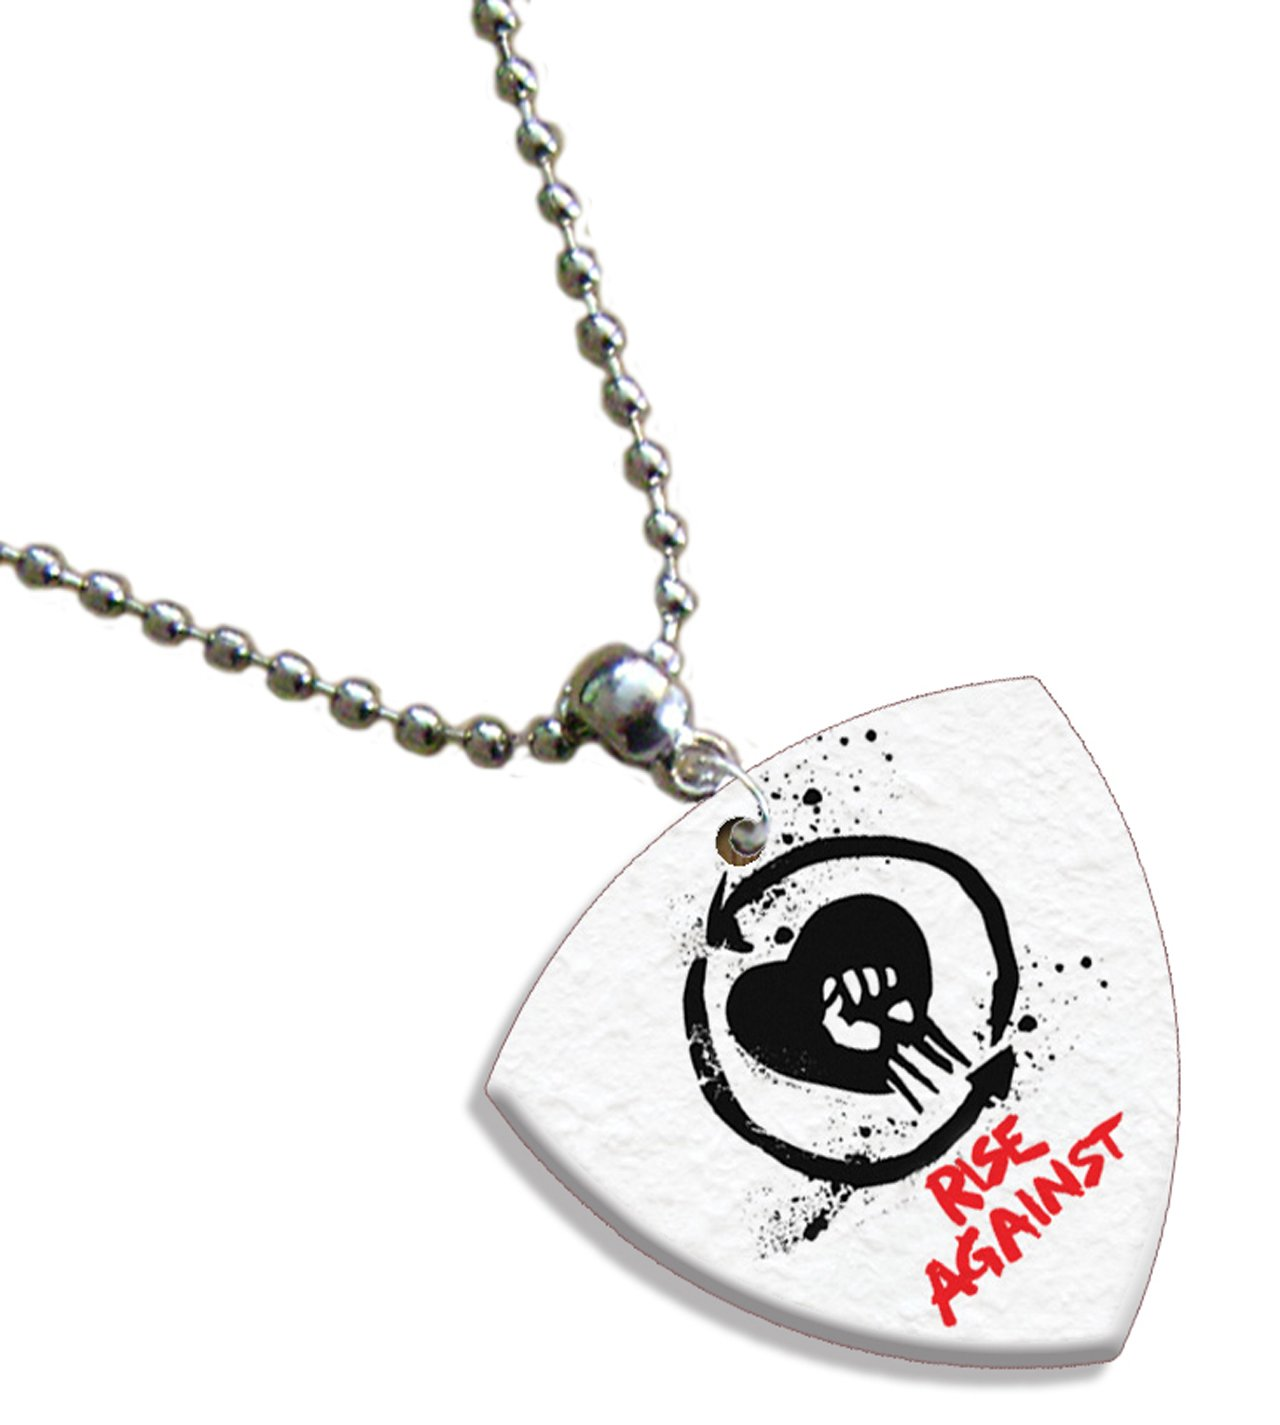 Rise Against kette Bass Guitar plektron Both Sides Printed Printed Guitar Picks